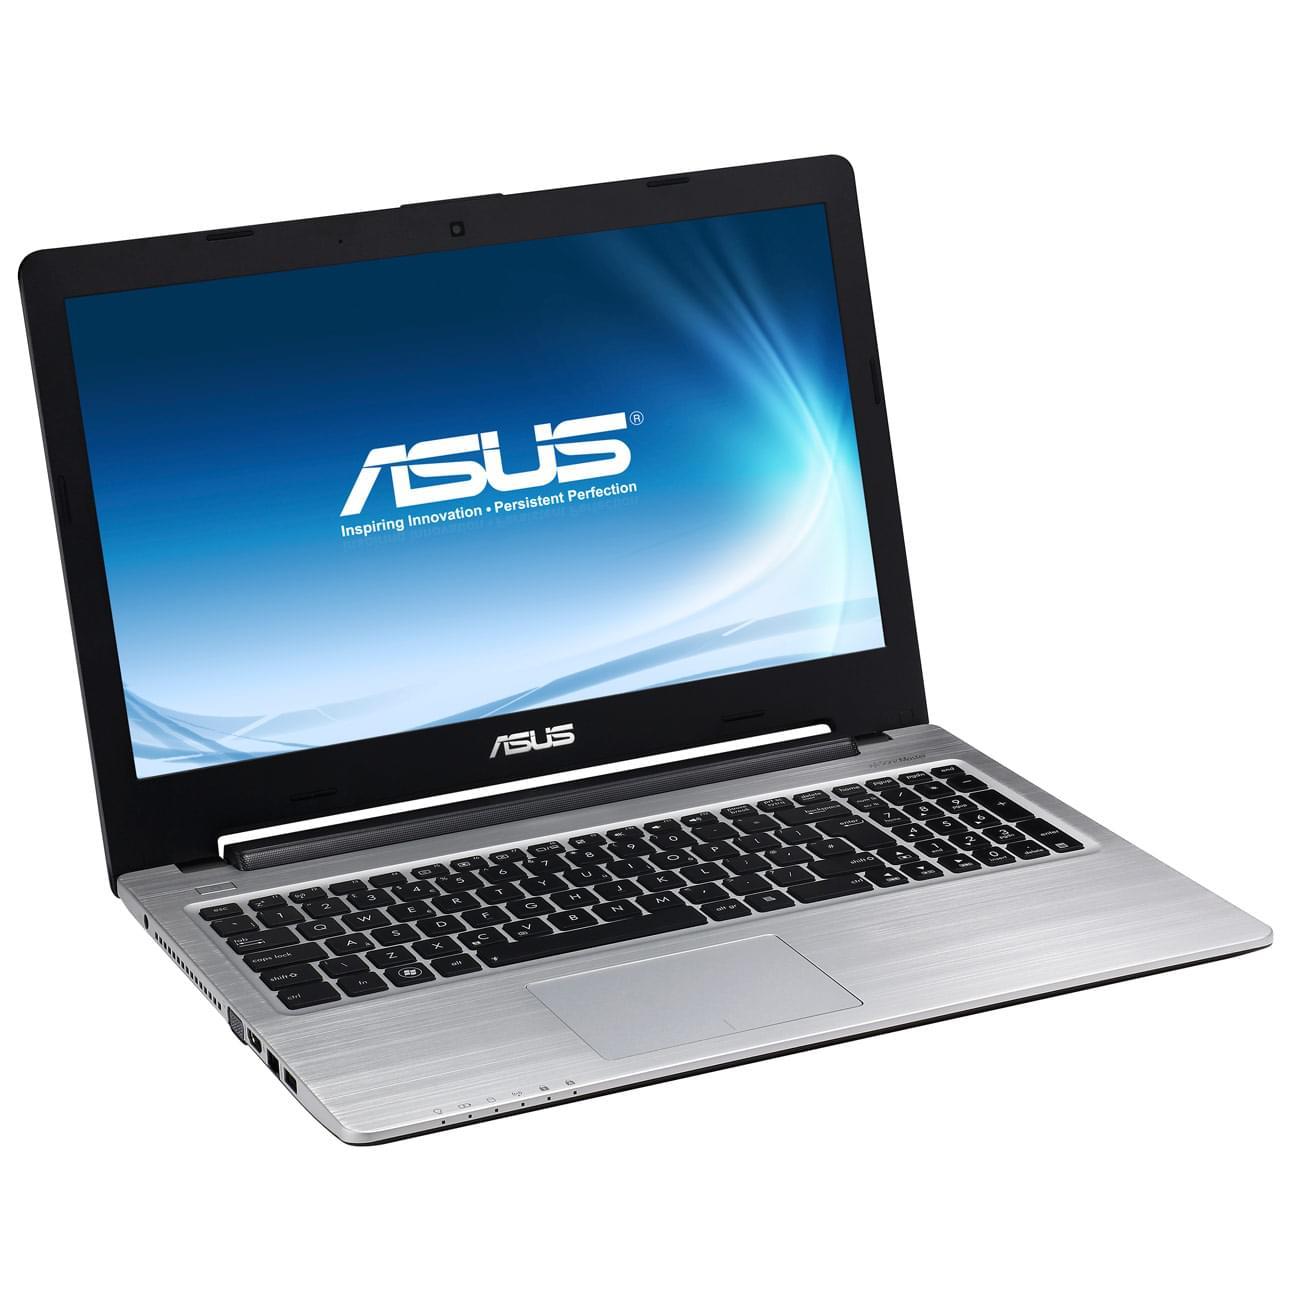 Asus K56CB-XO135H - PC portable Asus - Cybertek.fr - 0